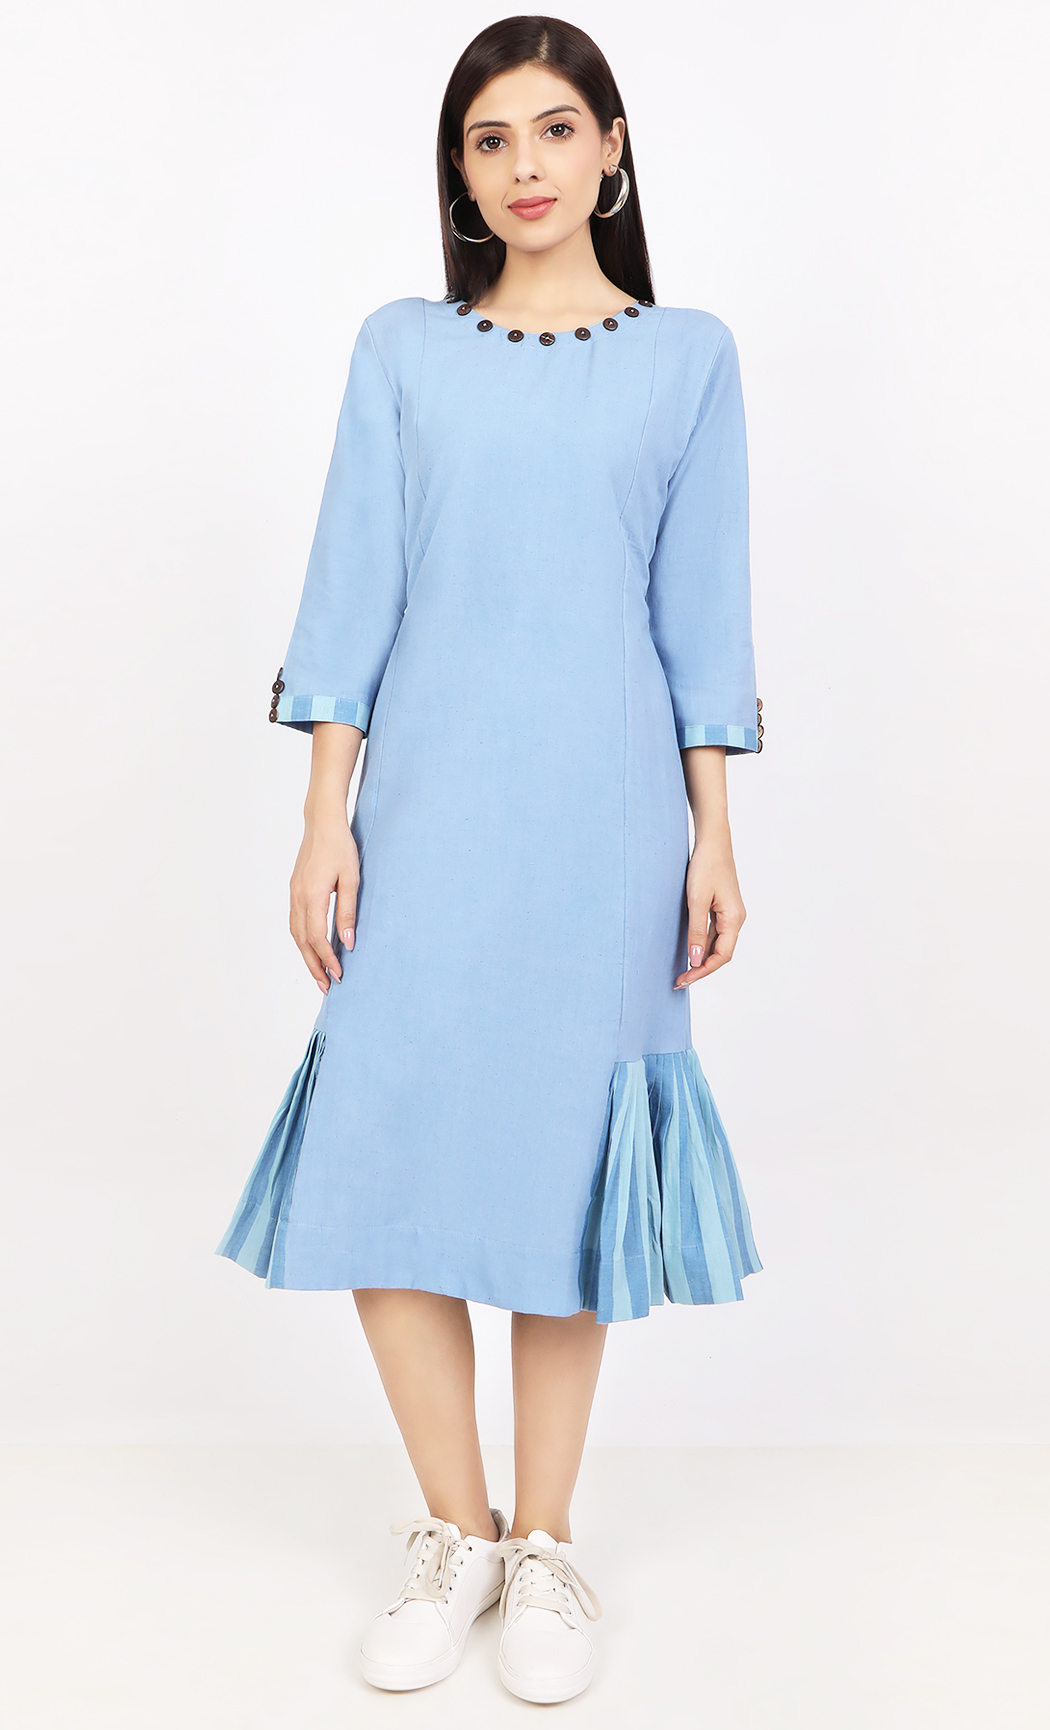 Blue Handloom Dress. Buy Online